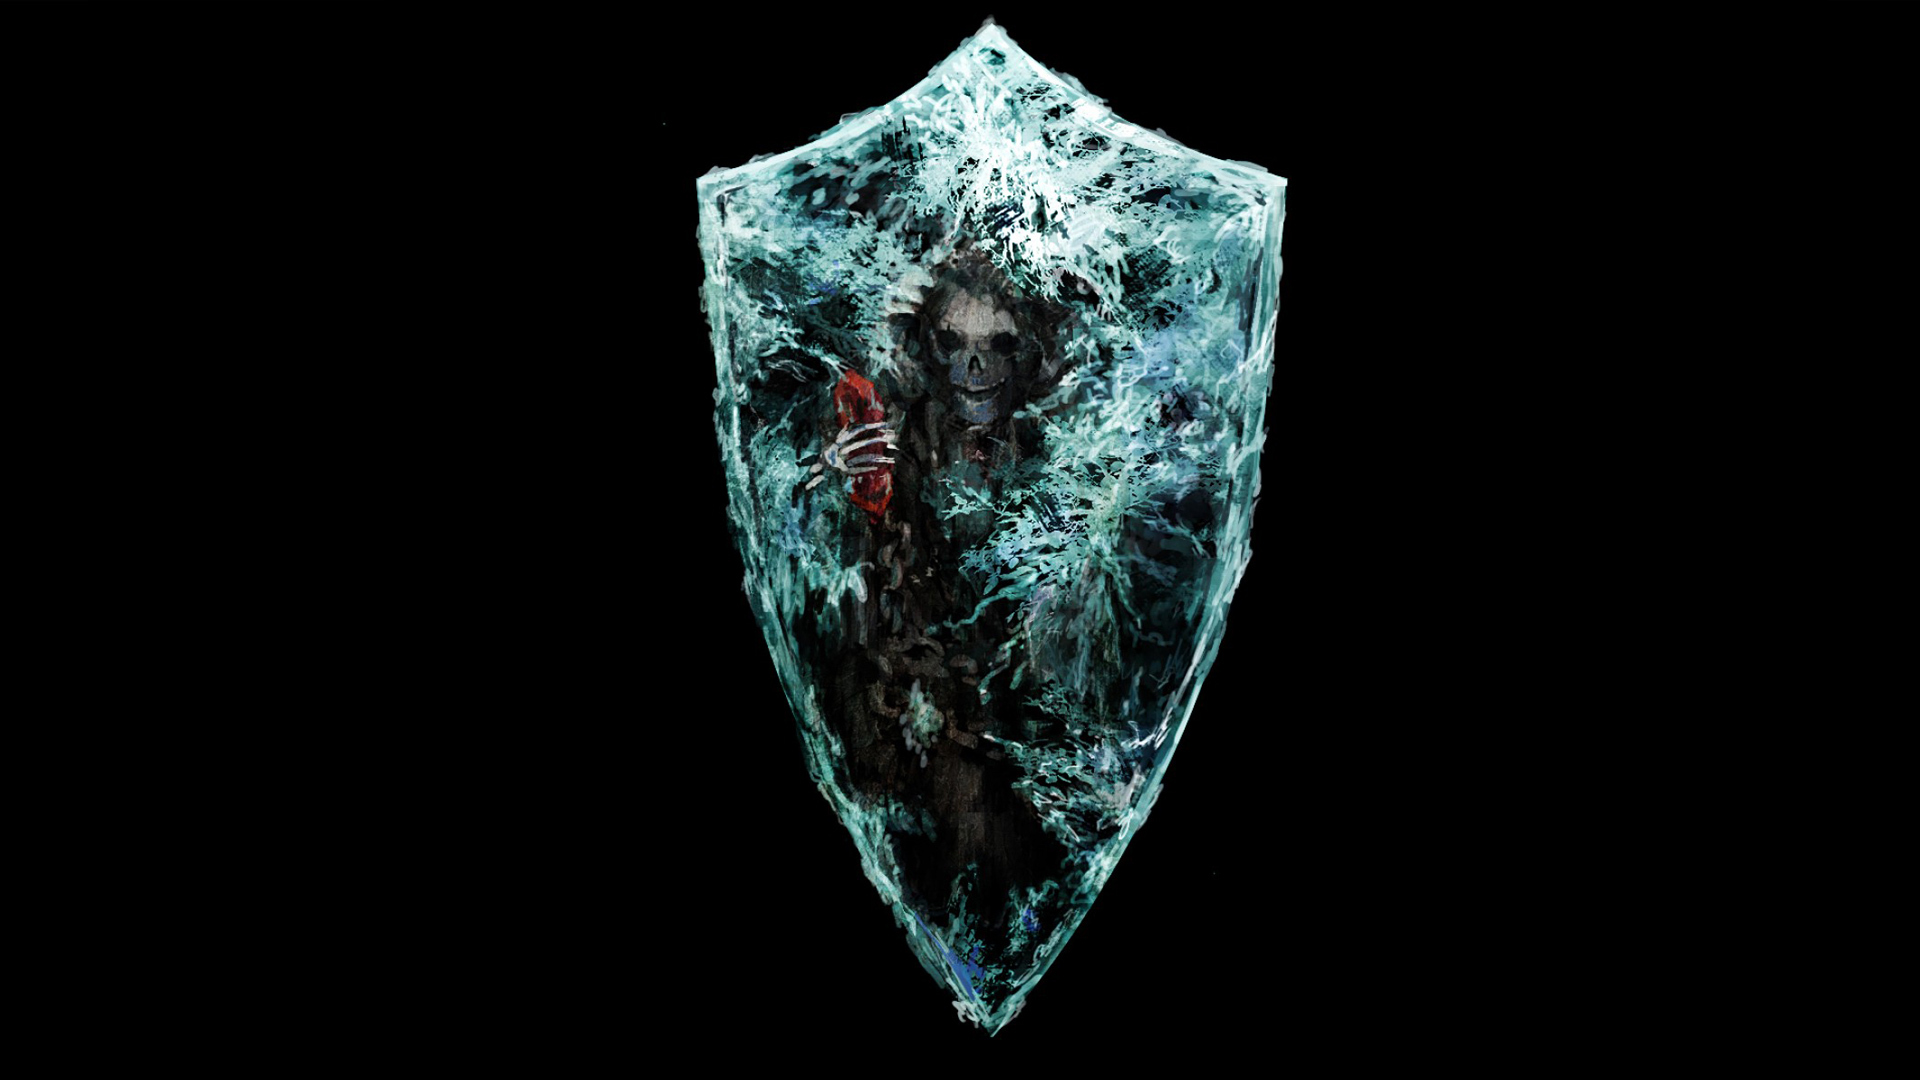 dark souls 2 ii game hd wallpaper image picture photo 1920x1080 1080p 1920x1080